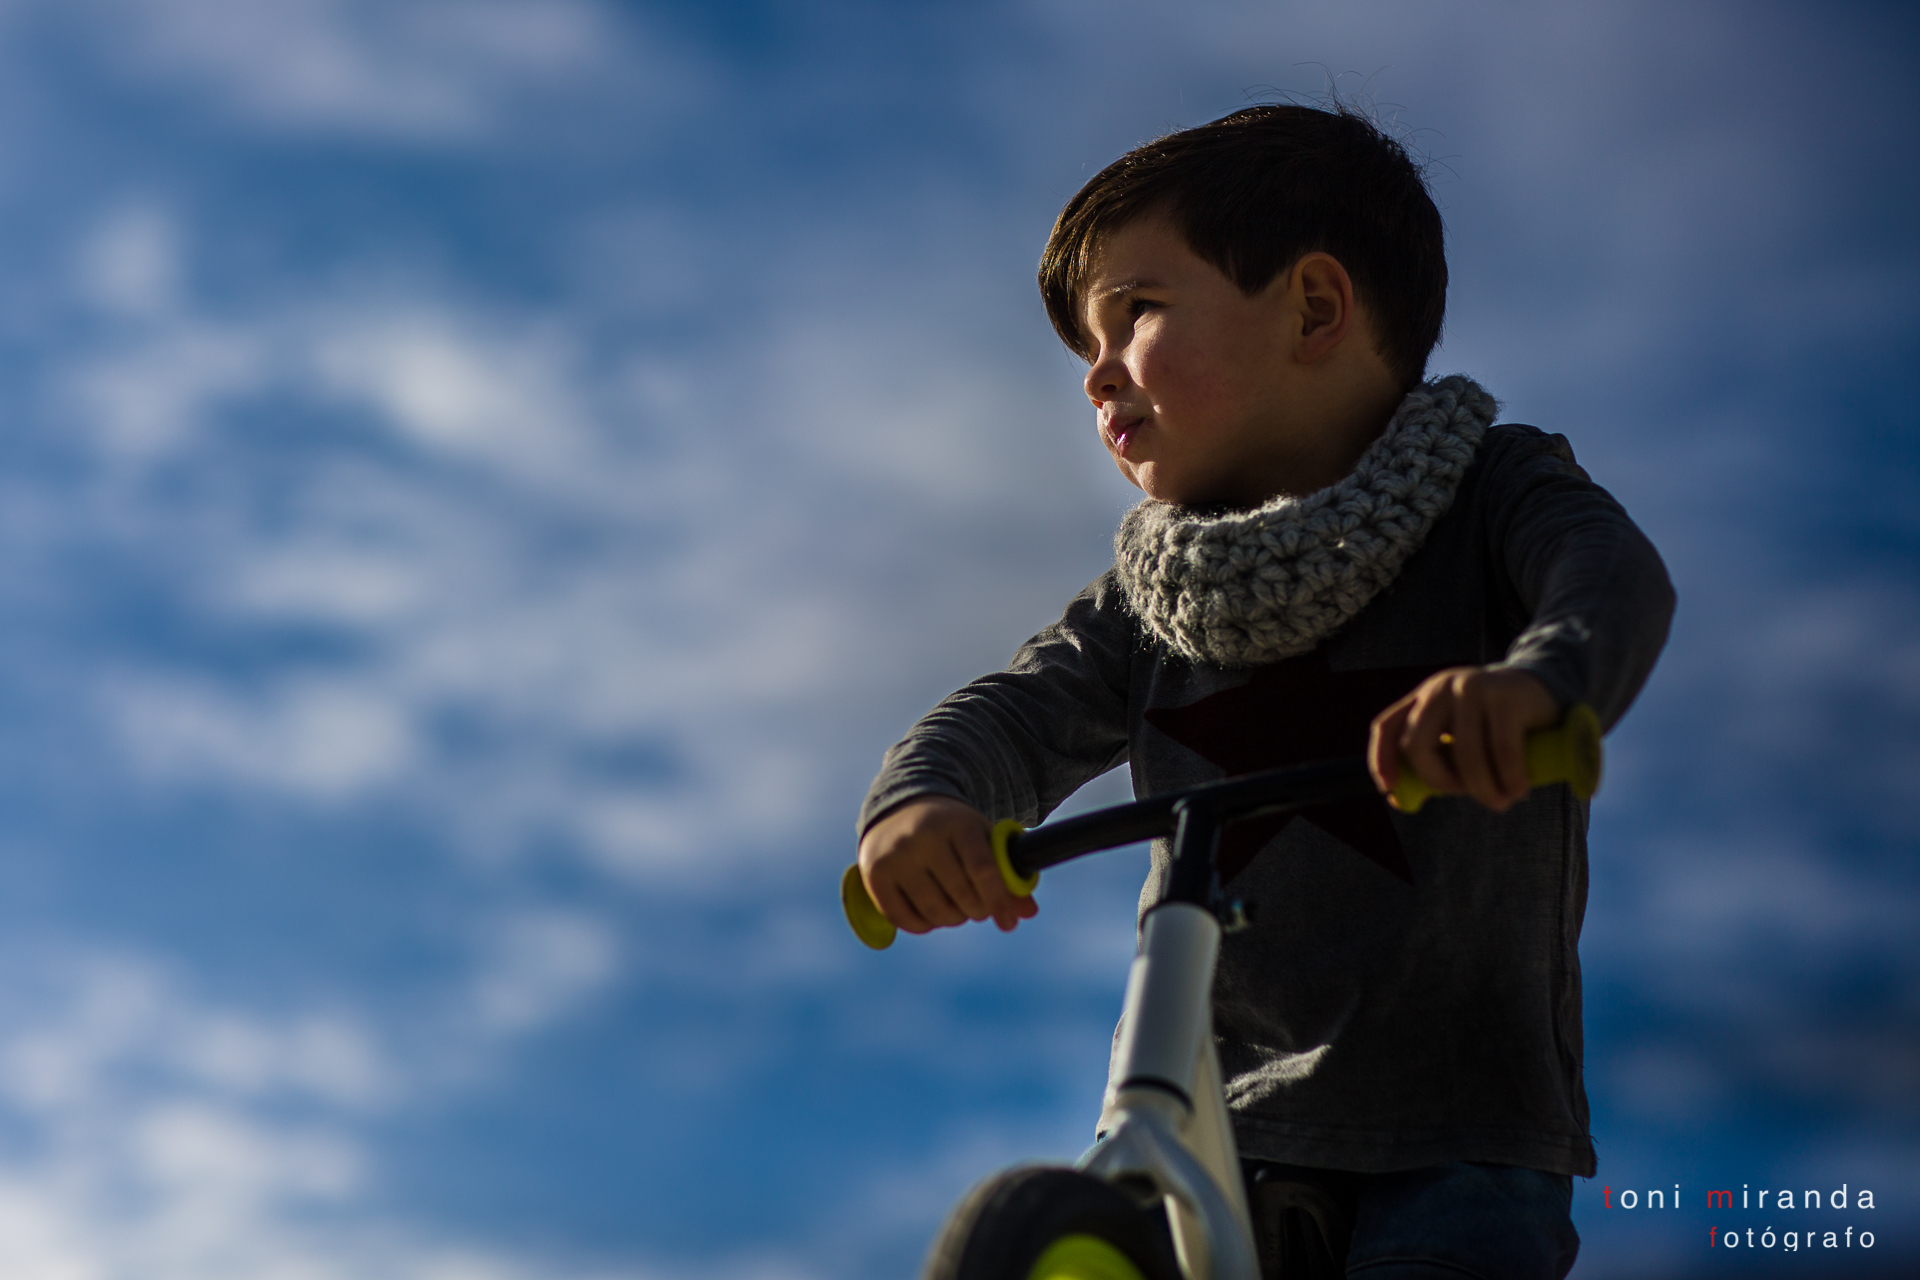 sesion infantil en alcoy con bicicleta